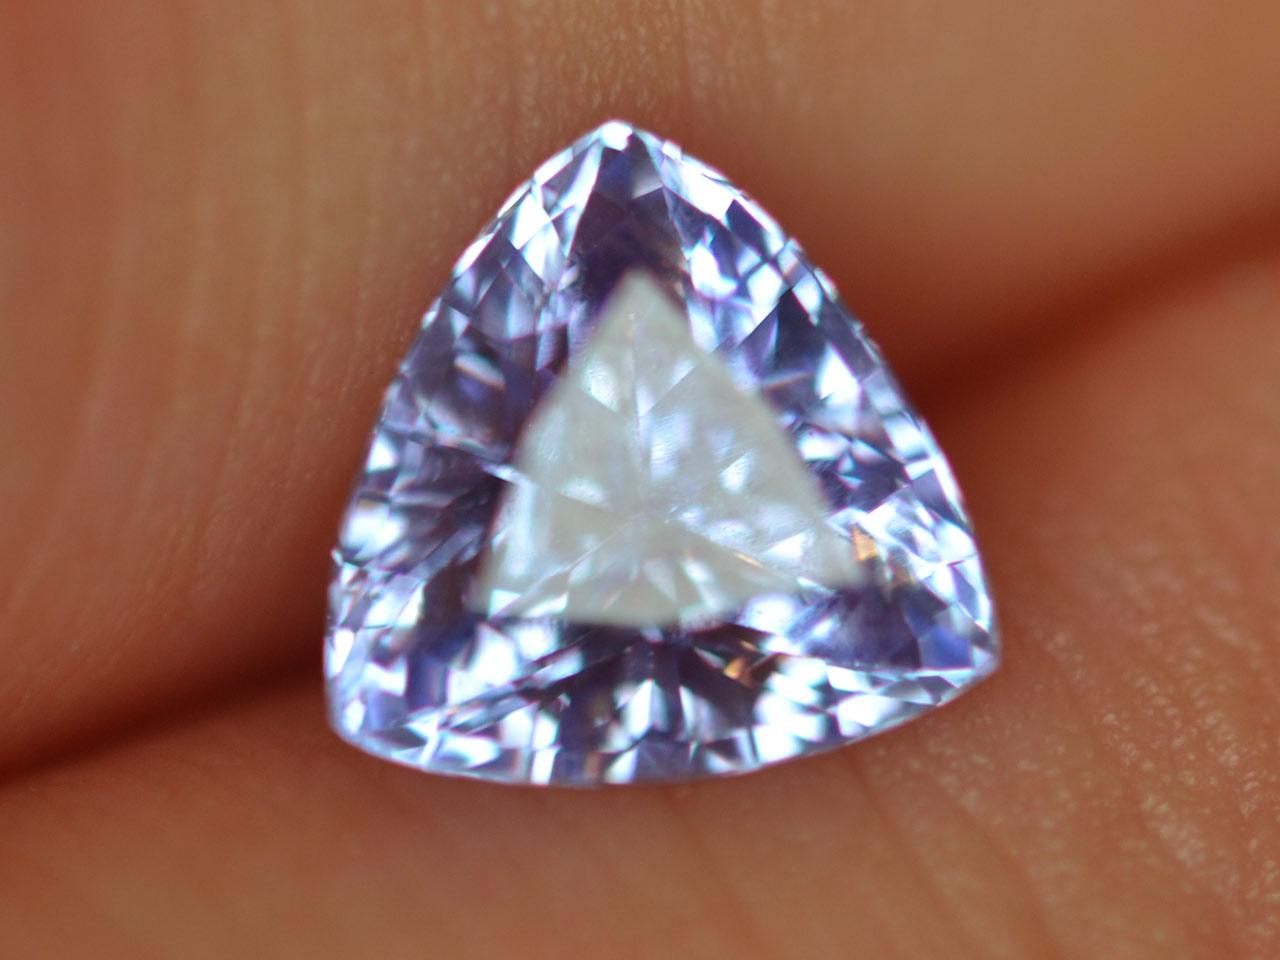 Lavender Trilliant Cut Ceylon Sapphire 1.45 cts 7x7mm